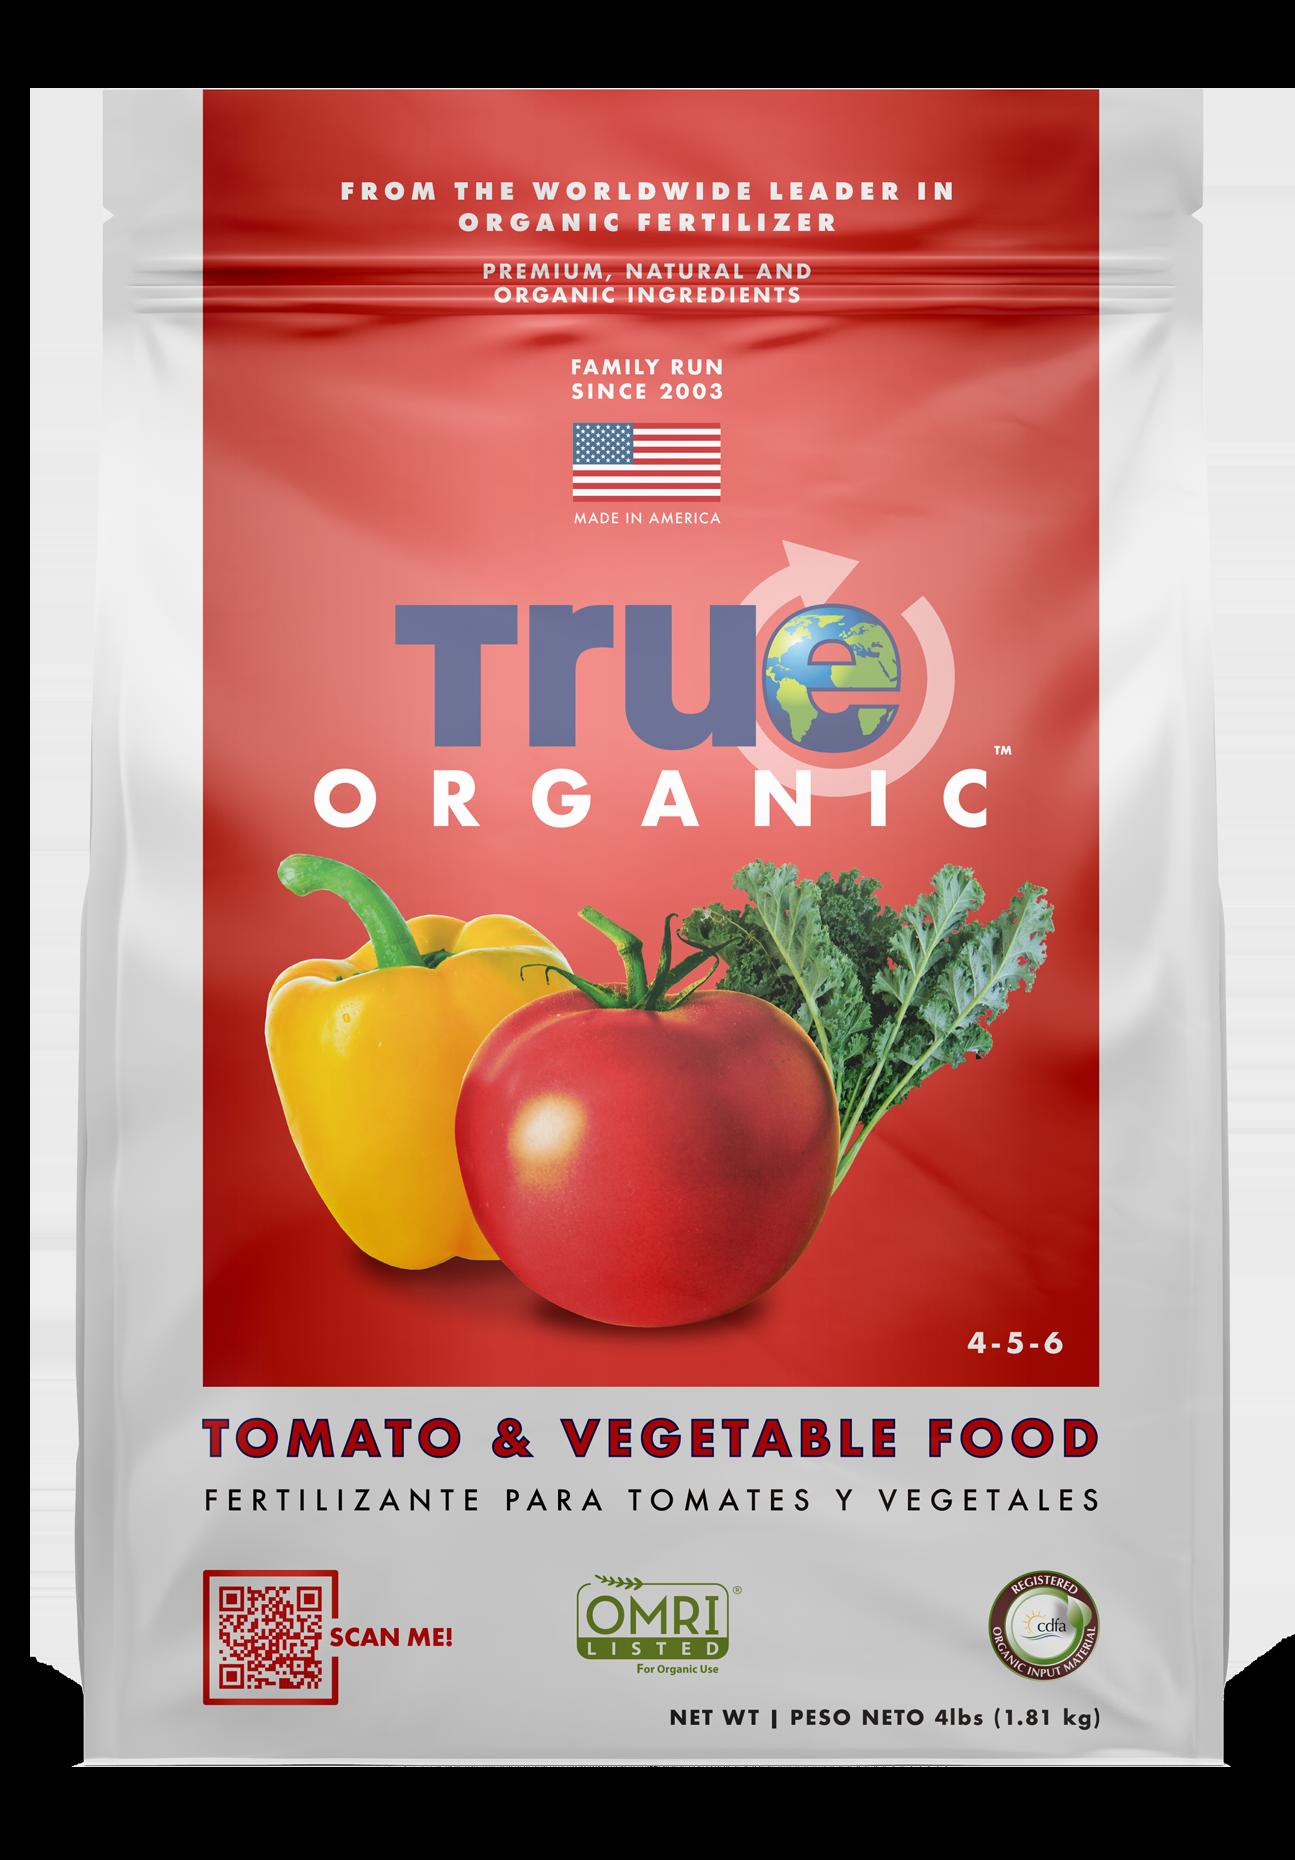 4 Lb Bag Of True Organic Tomato & Vegetable Food